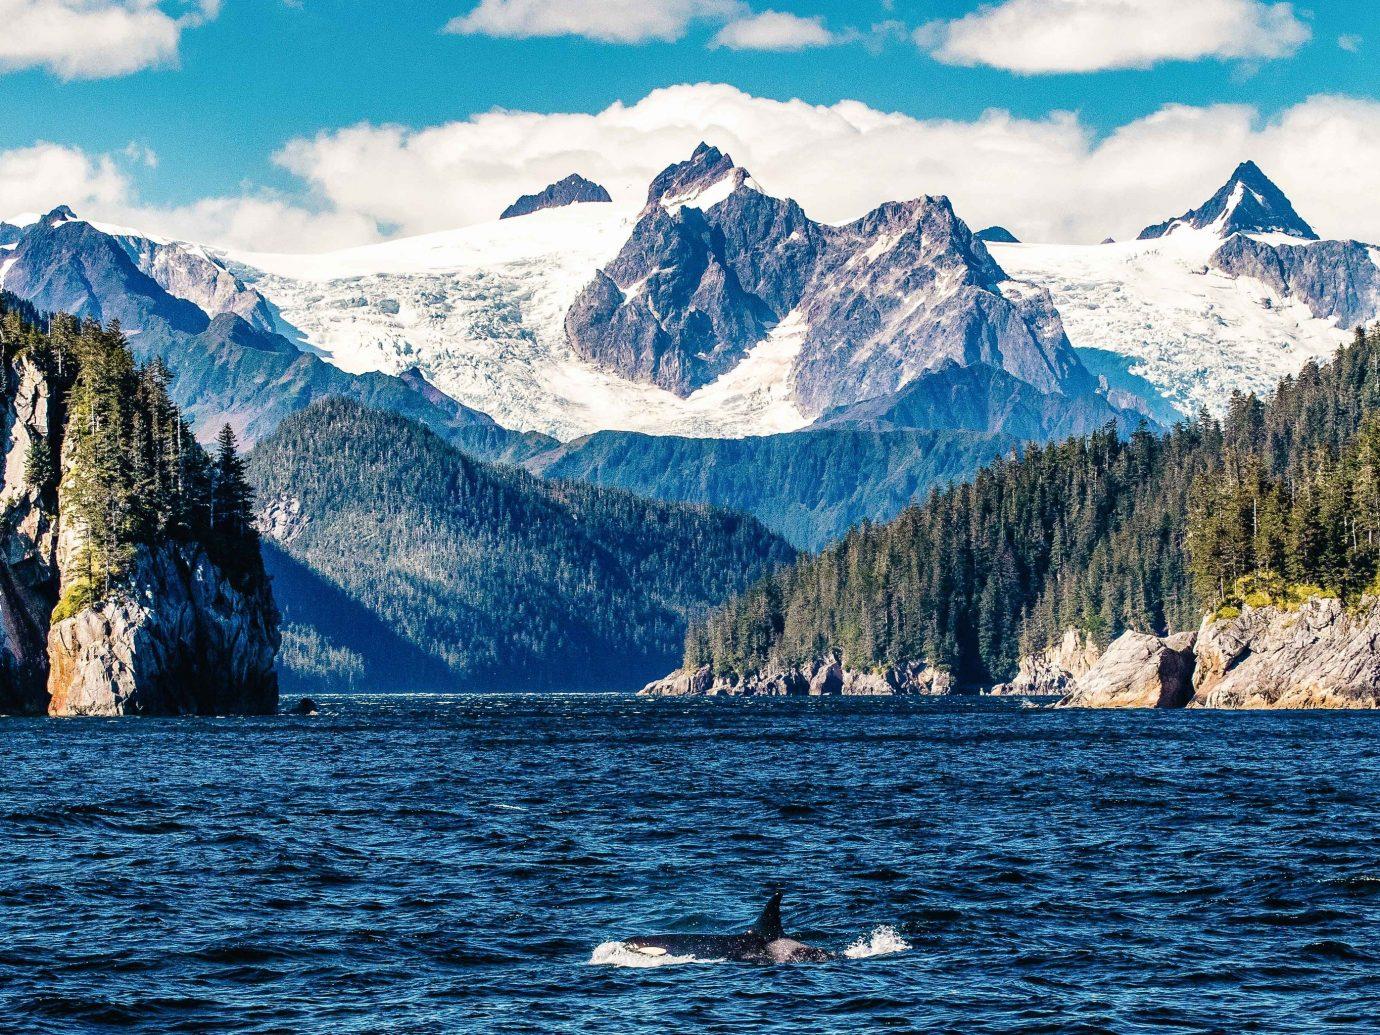 Kenai Fjords, Alaska Mountain Range